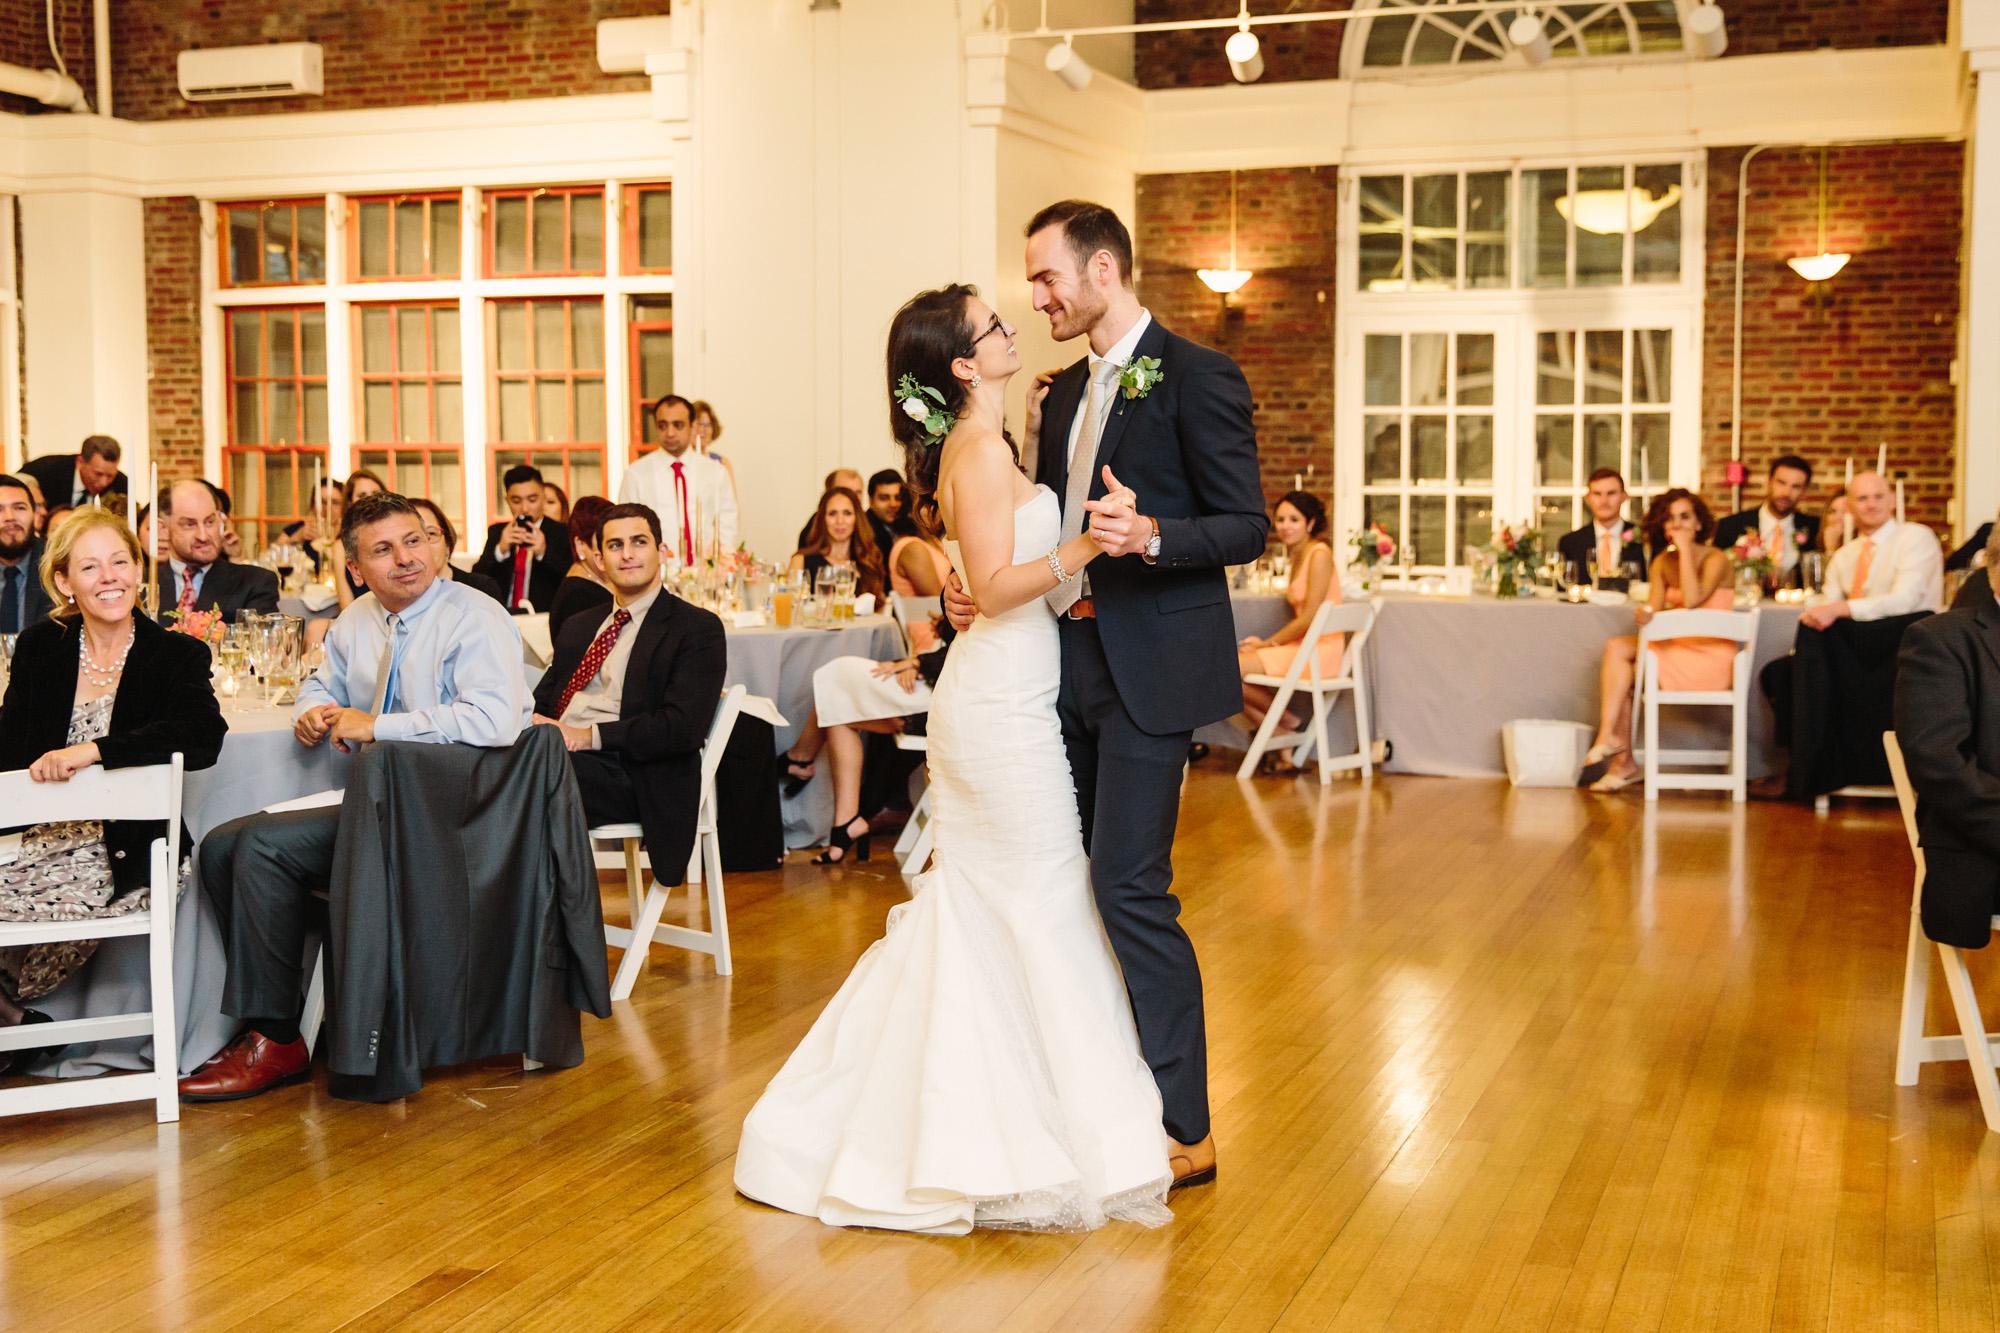 37_Kate_Sam_Picnic_House_Wedding_Brooklyn_NY_Tanya_Salazar_Photography_875.jpg